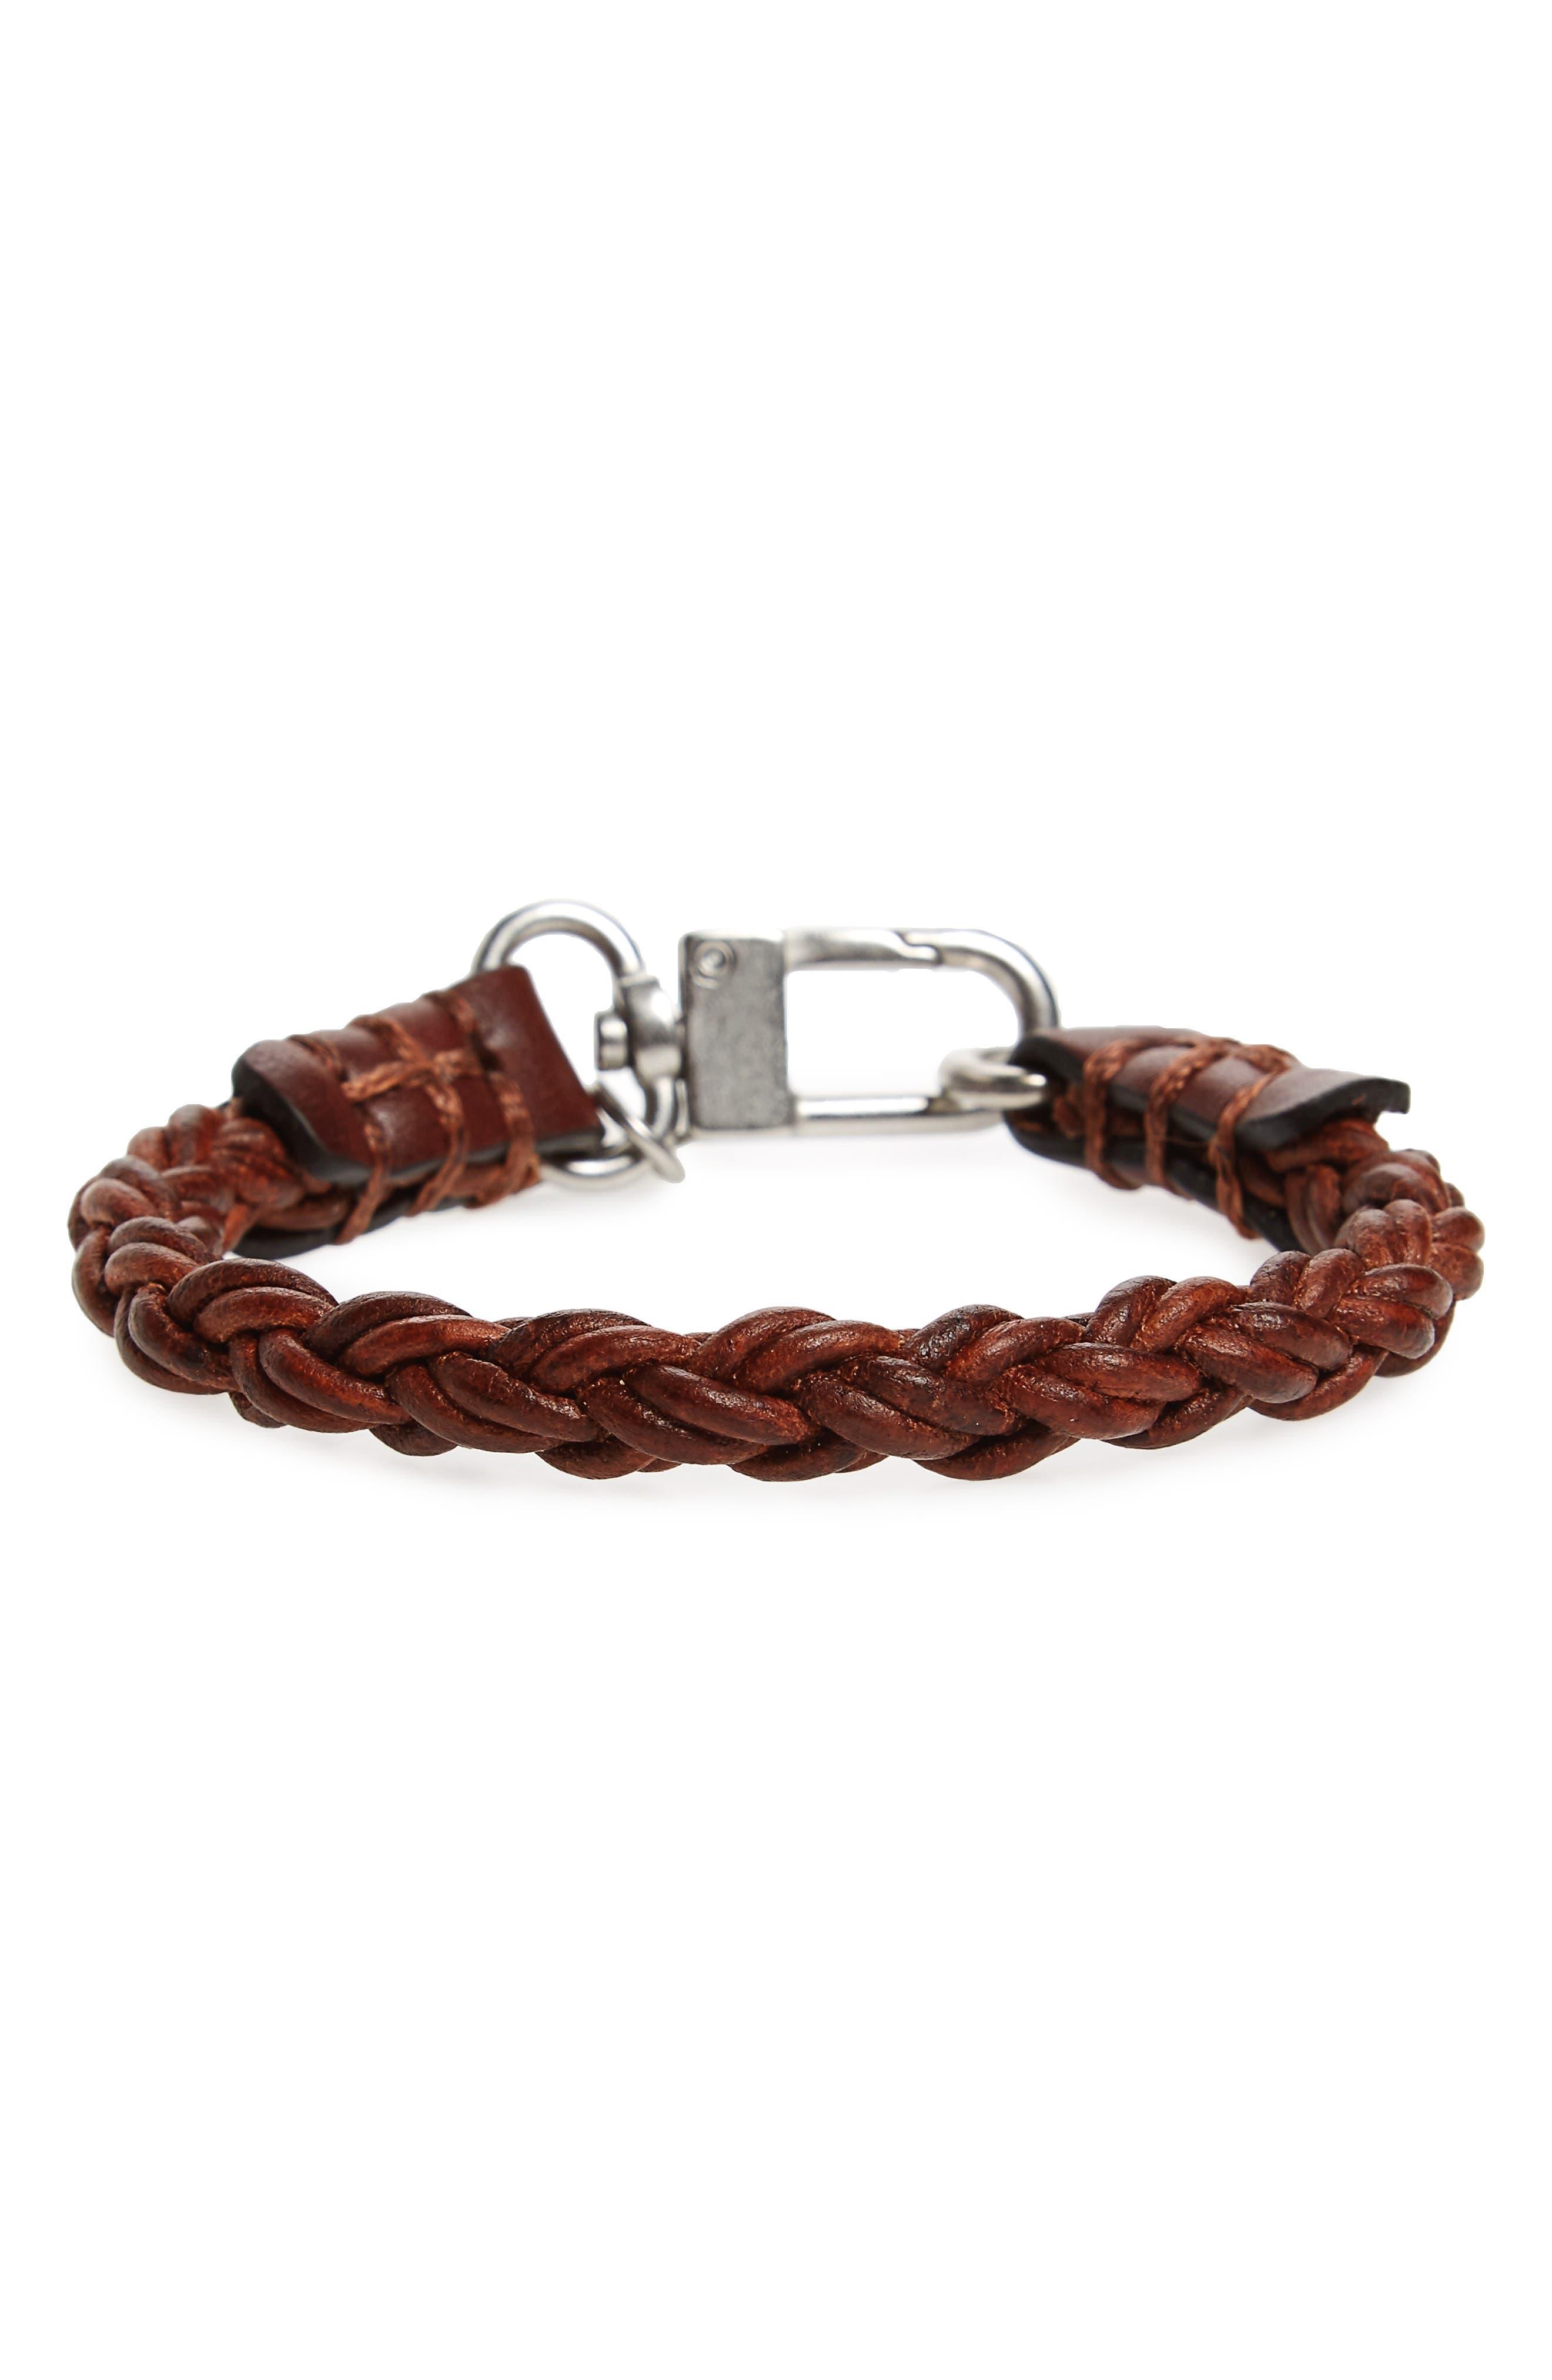 Alternate Image 1 Selected - Caputo & Co. Leather Bracelet